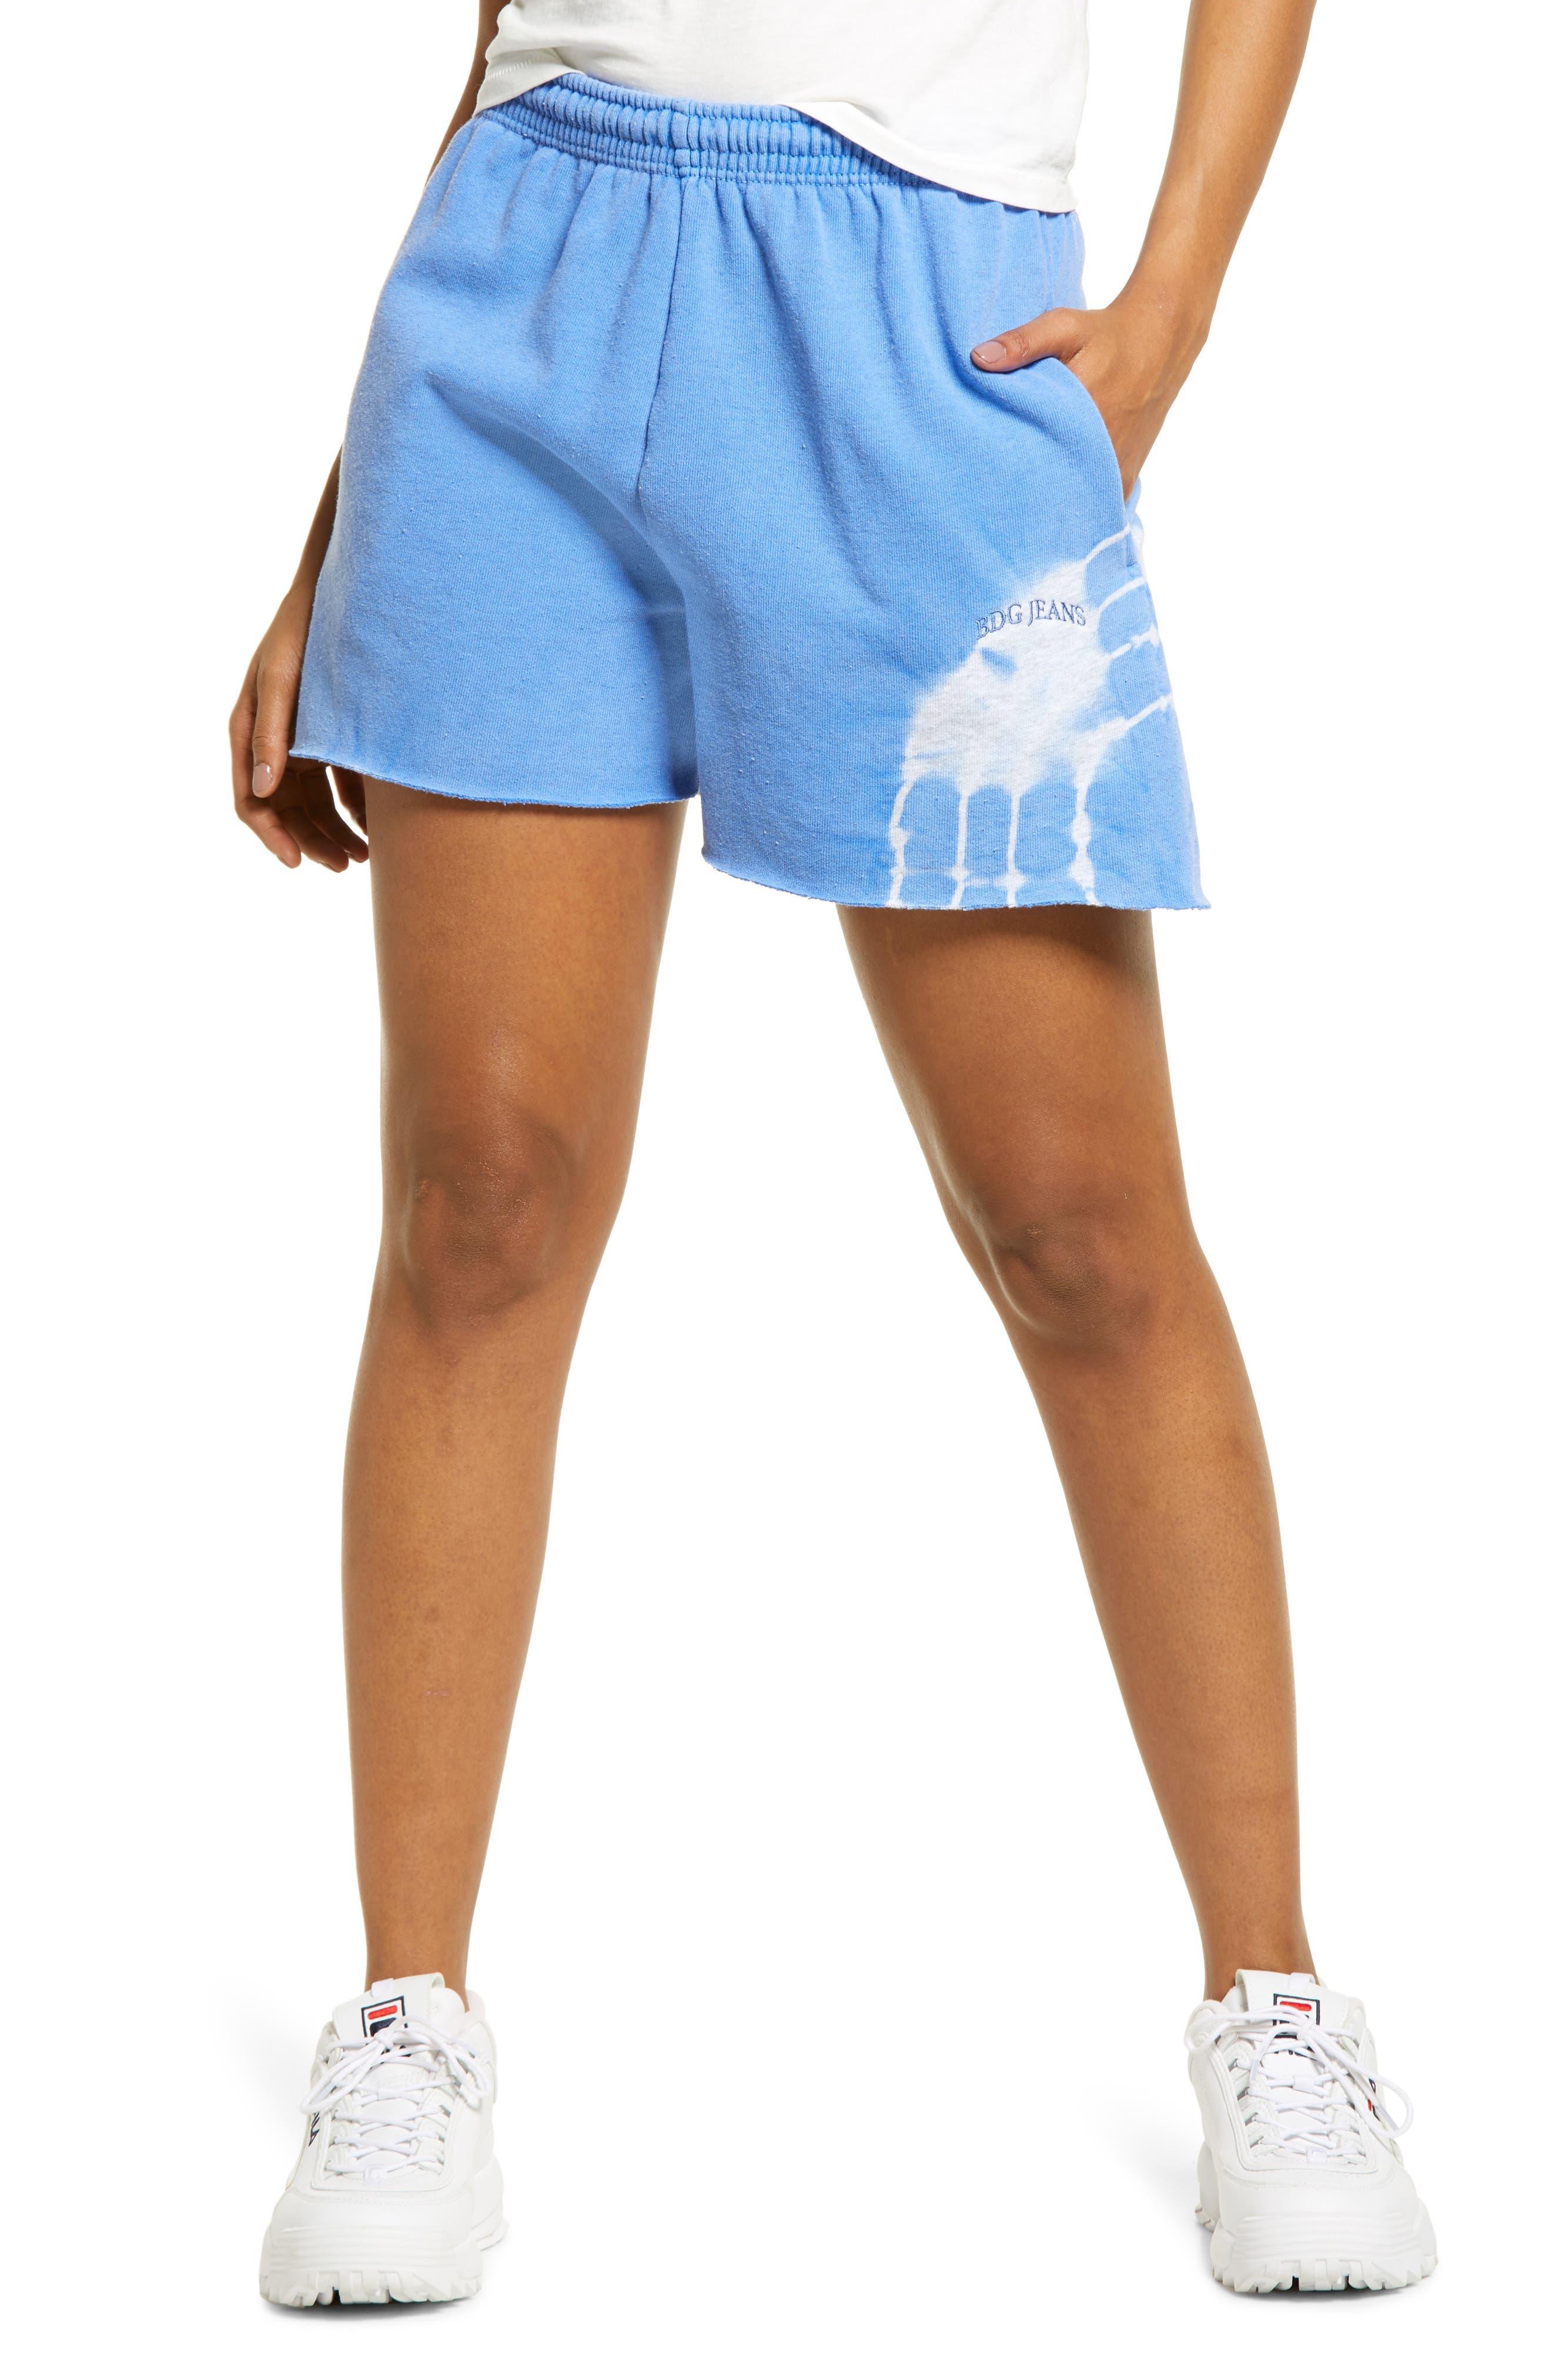 Women's Jogger Shorts